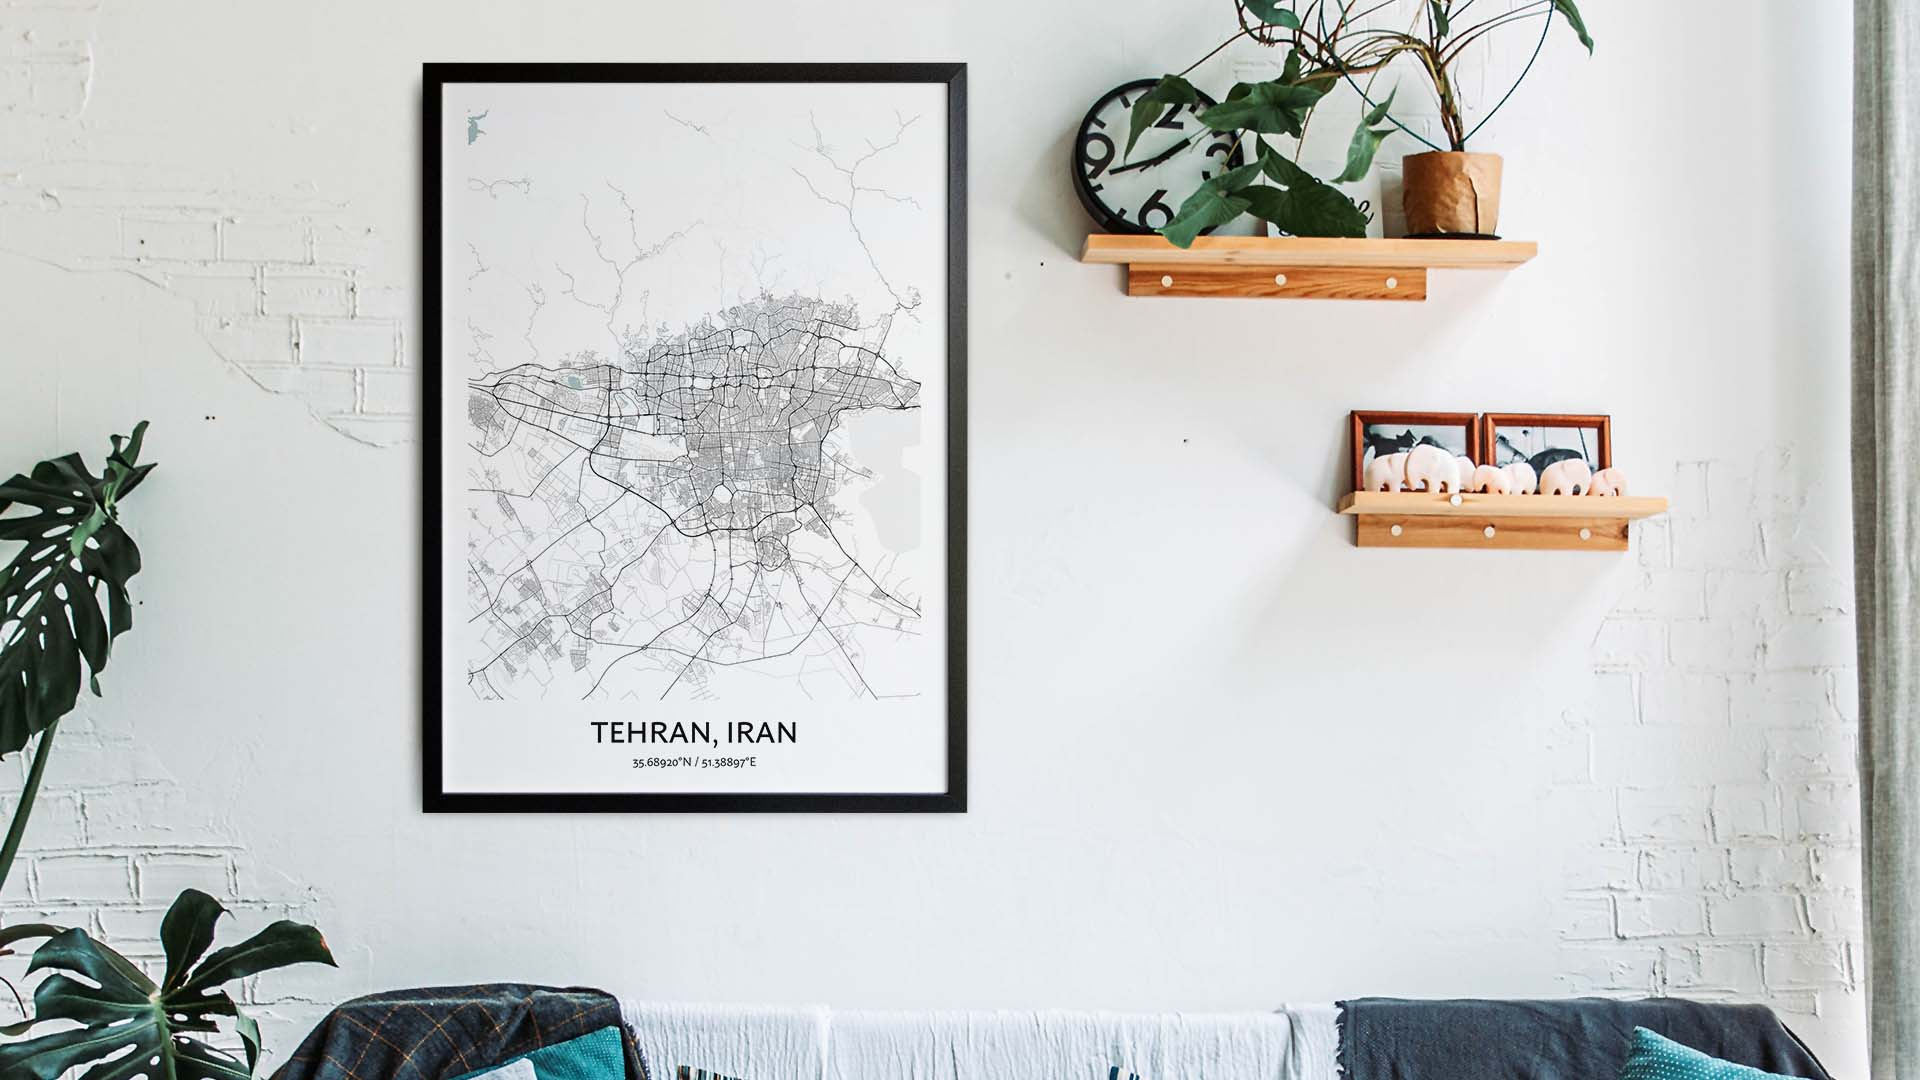 Tehran map art